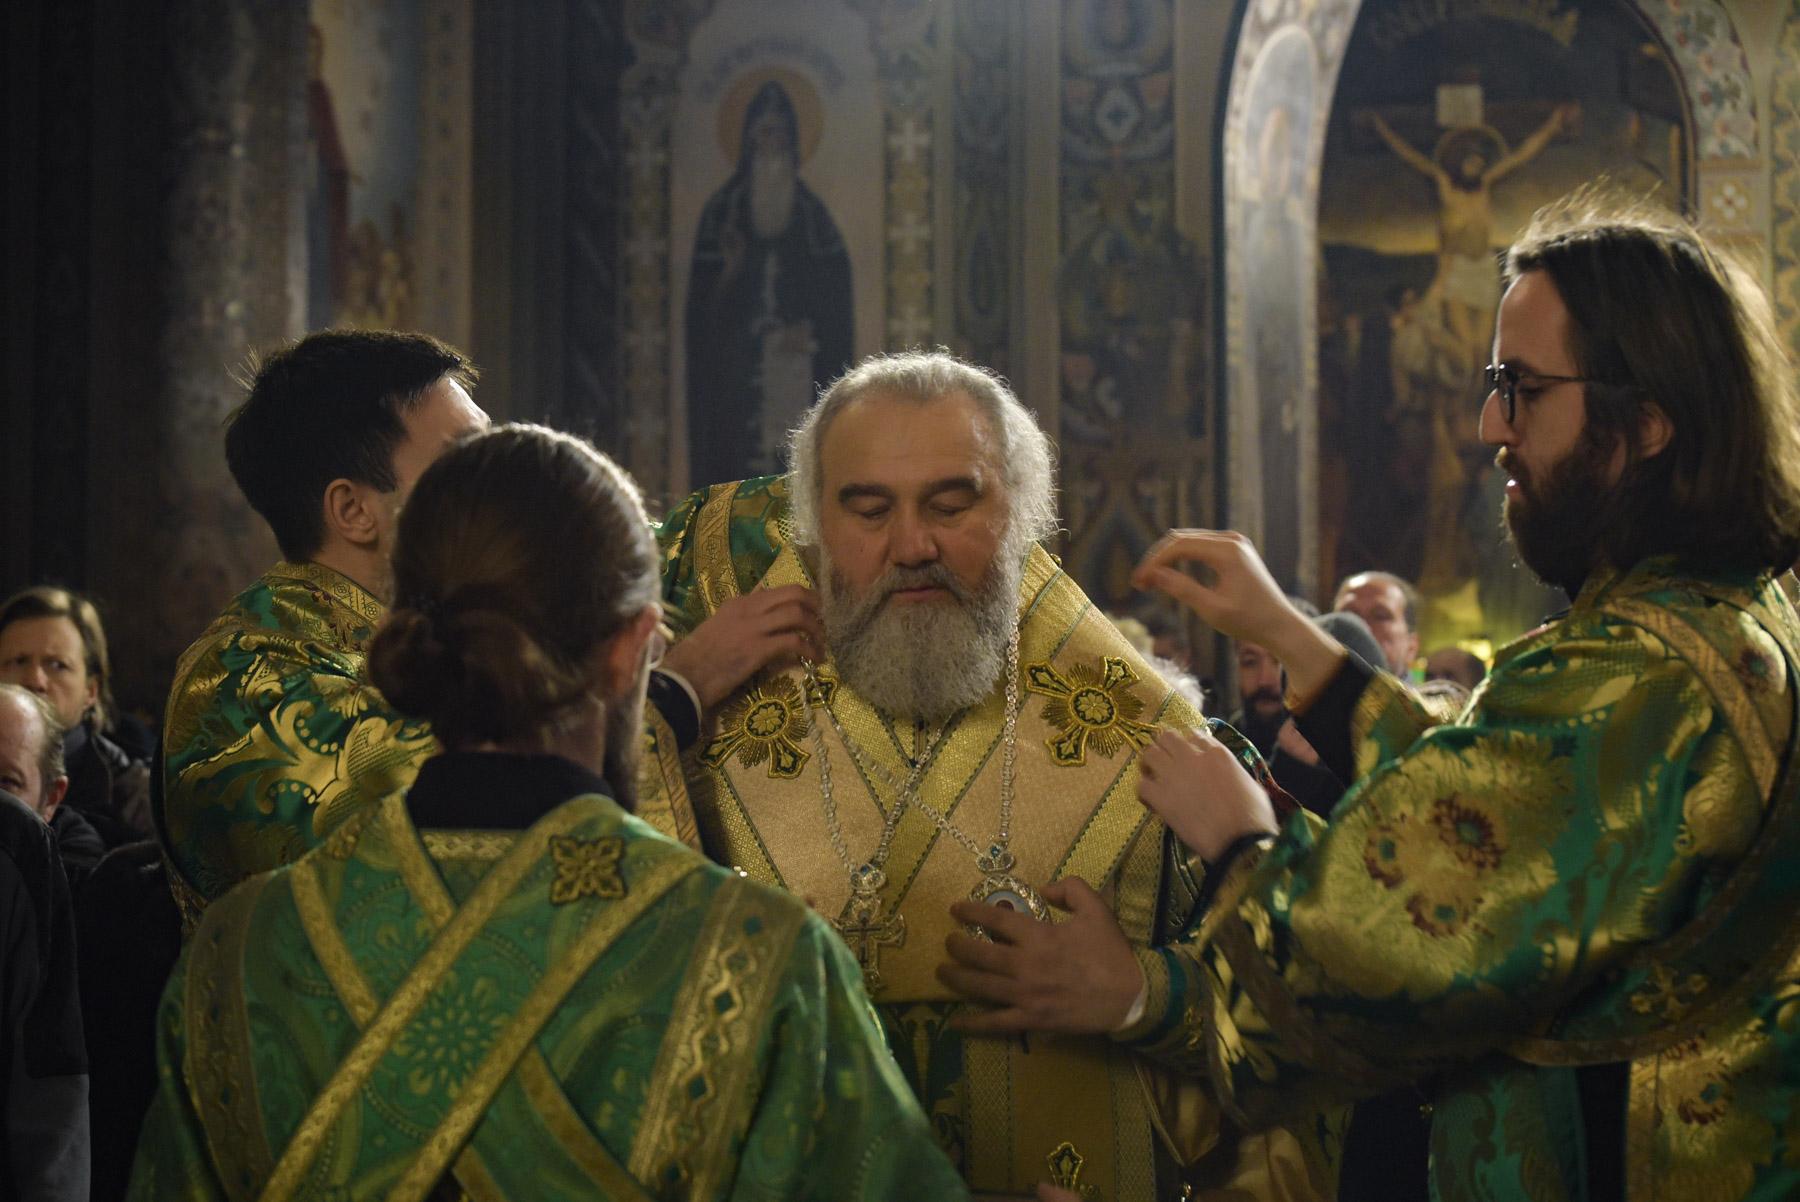 photos of orthodox christmas 0049 2